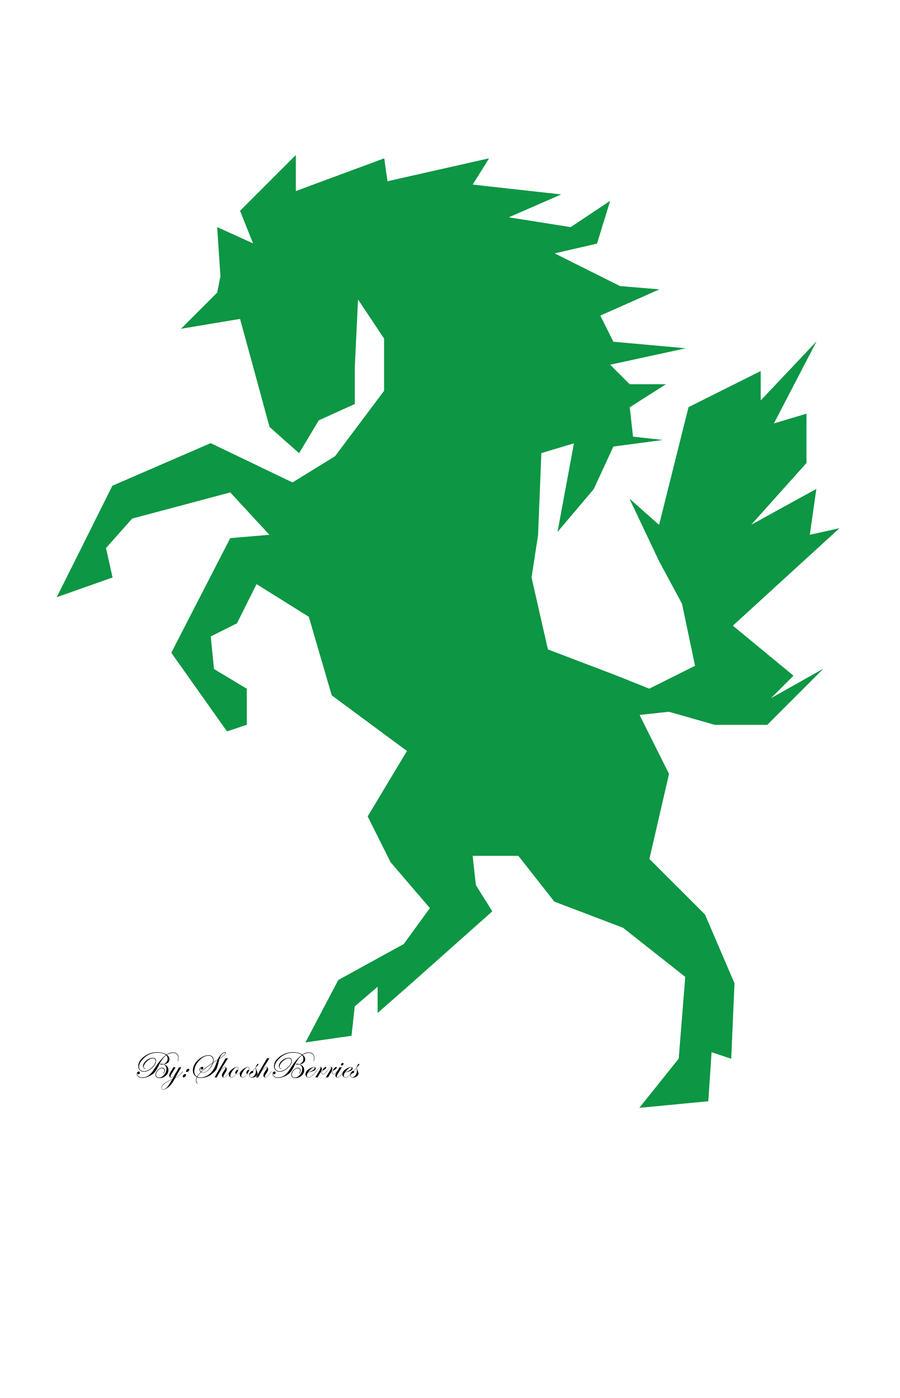 horse logo clipart - photo #30